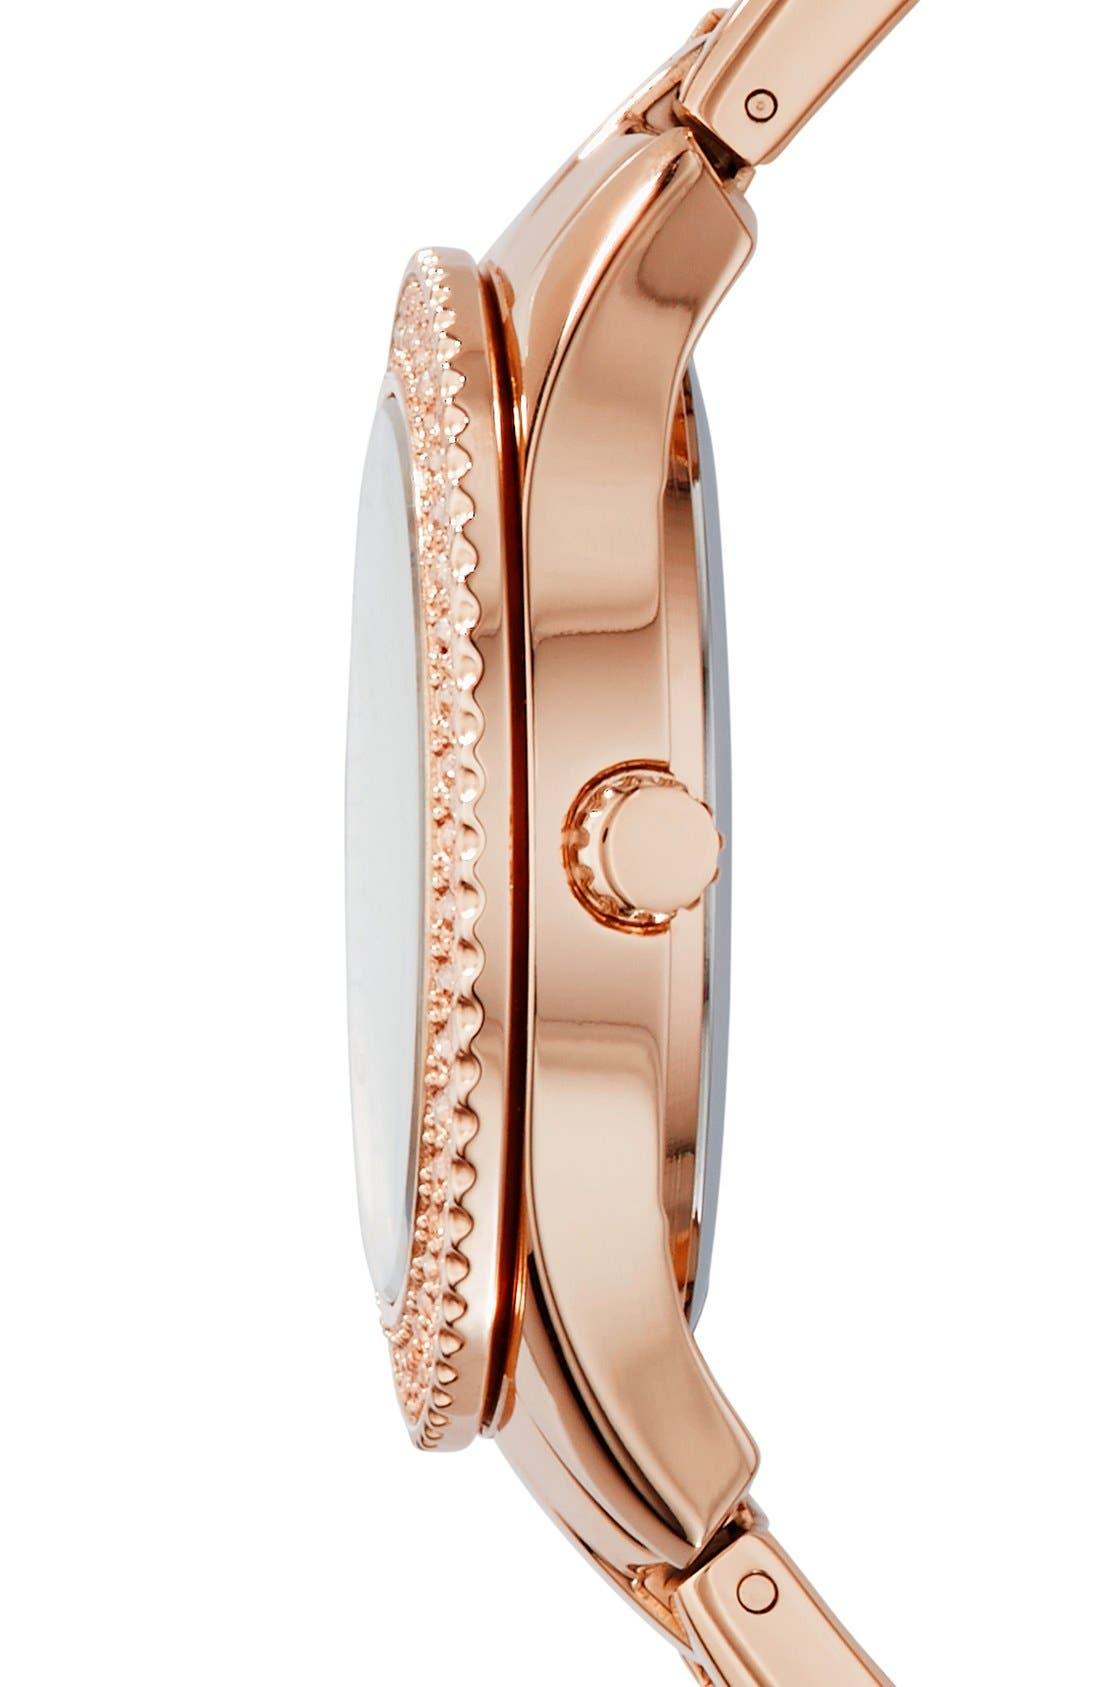 FOSSIL, 'Stella' Crystal Bezel Multifunction Bracelet Watch, 38mm, Alternate thumbnail 3, color, ROSE GOLD